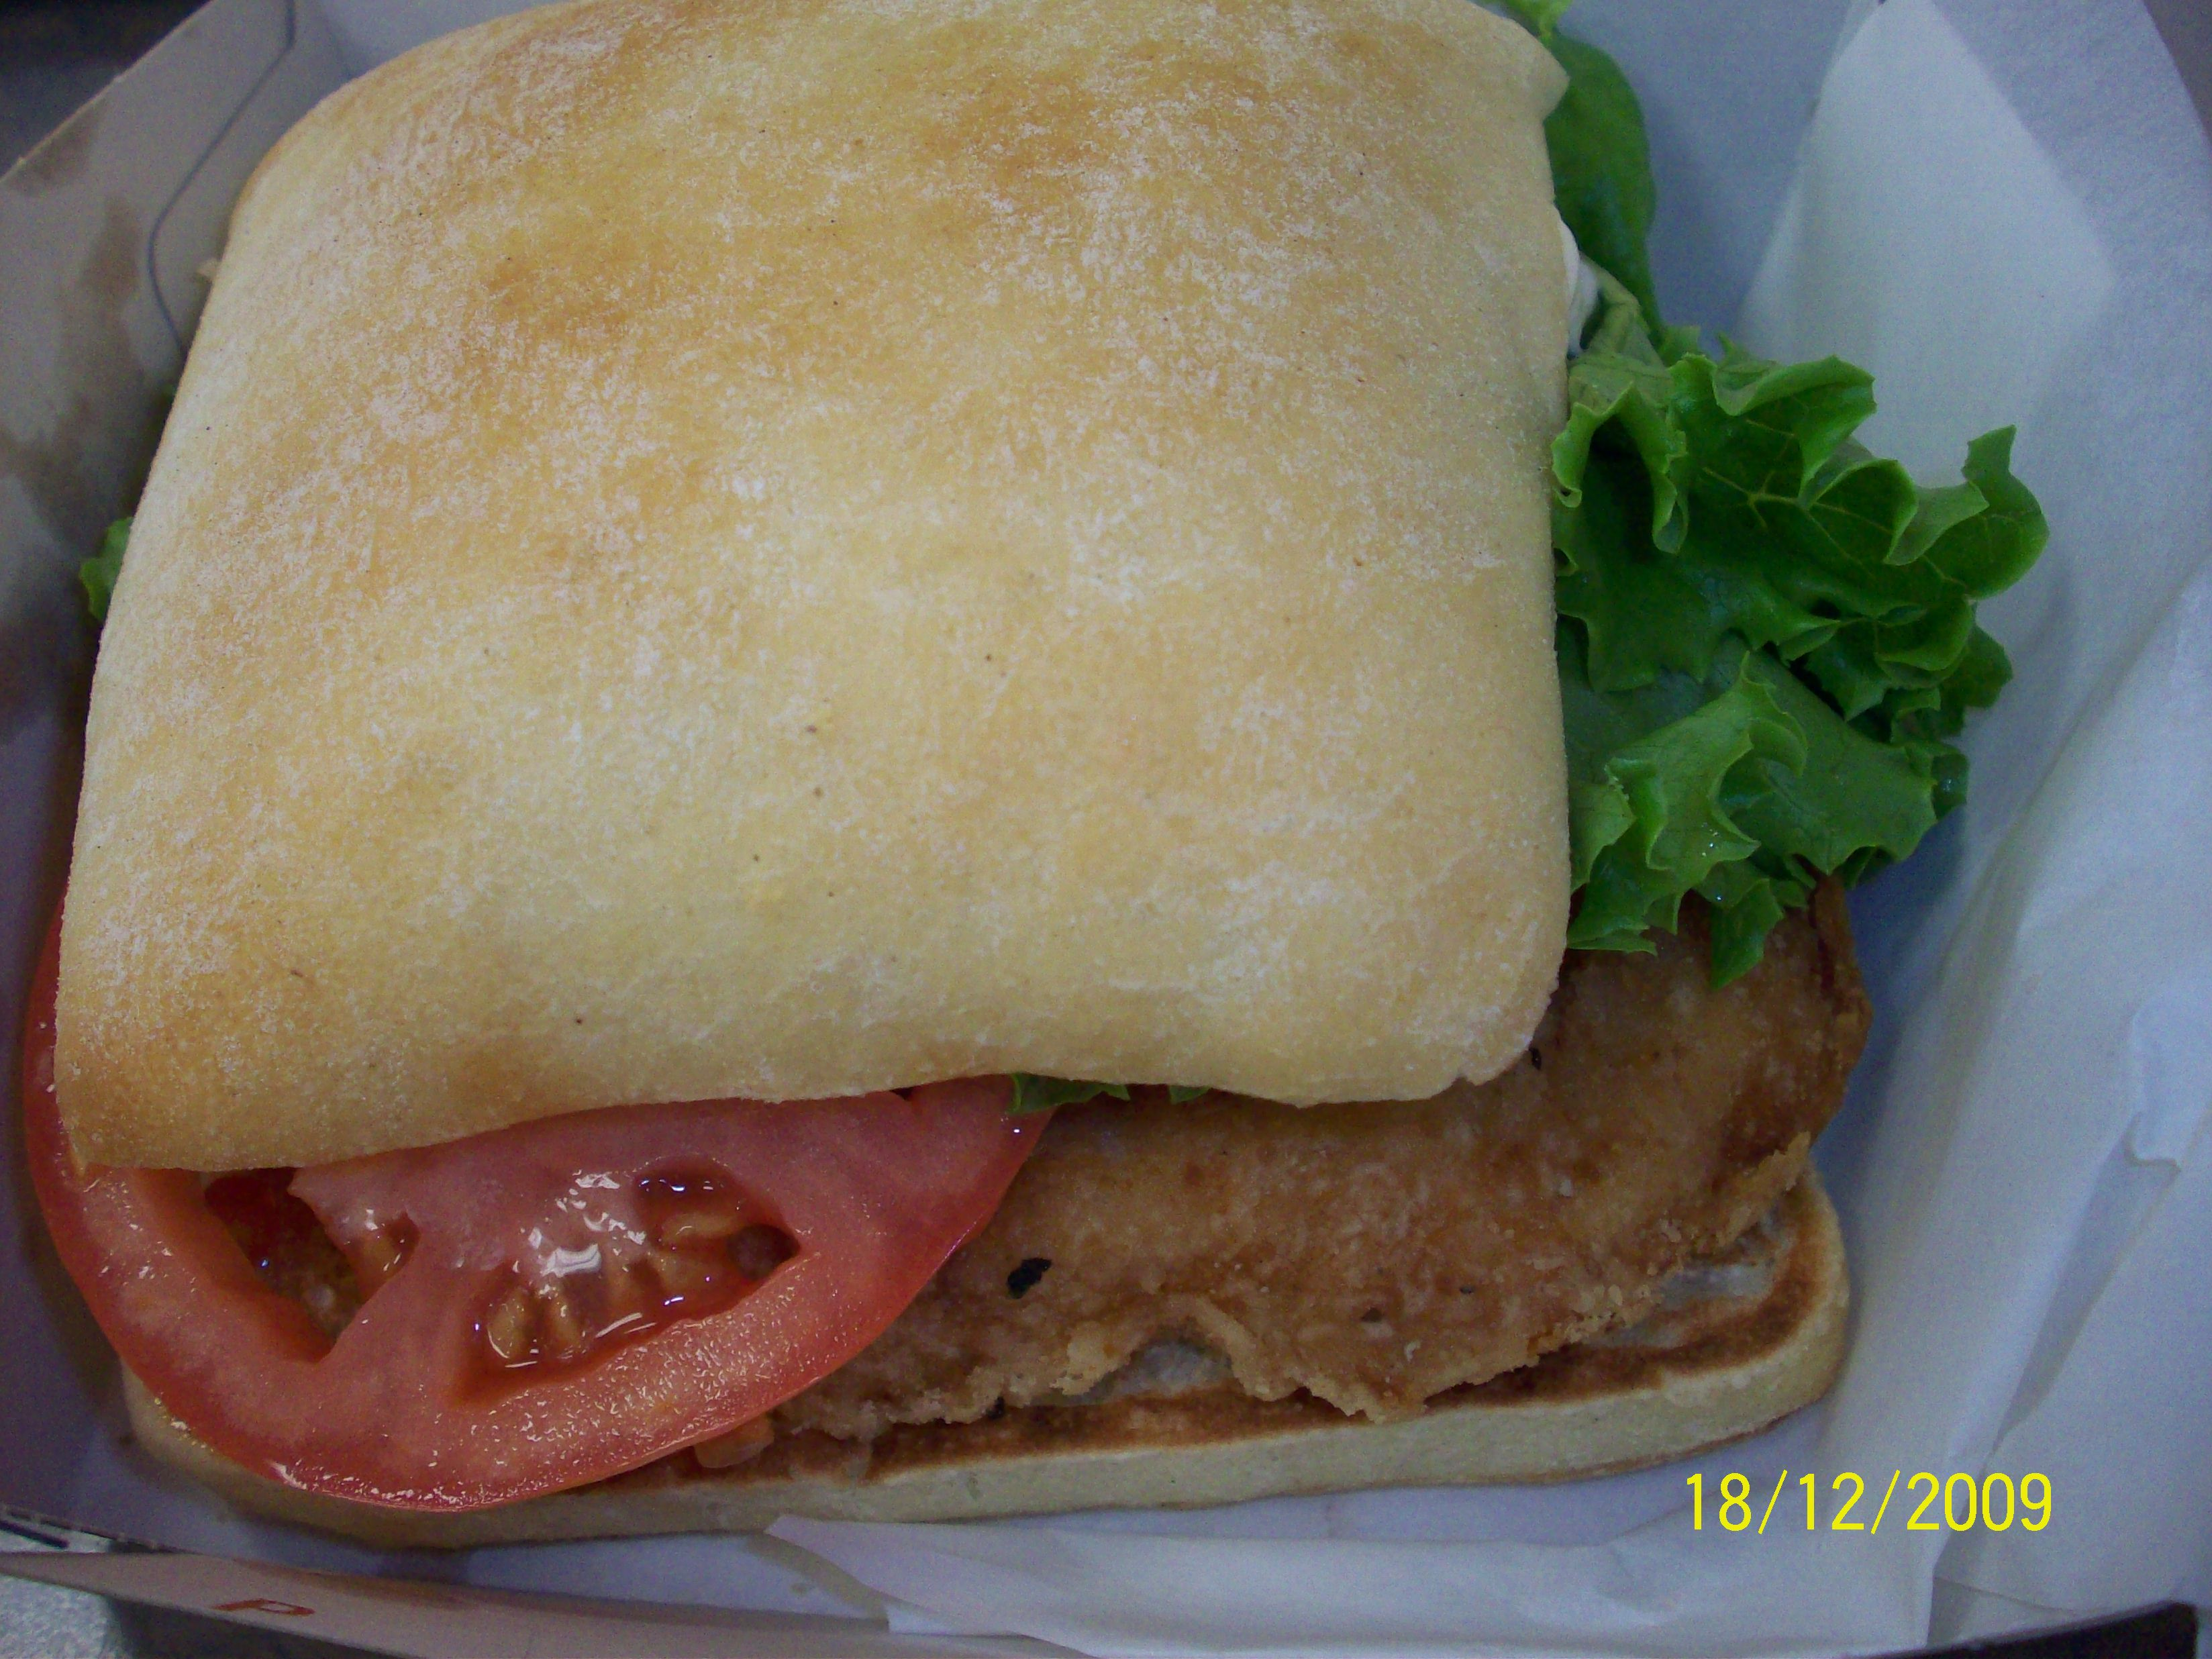 https://foodloader.net/cutie_2009-12-18_Crispy_McChicken_Burger.jpg